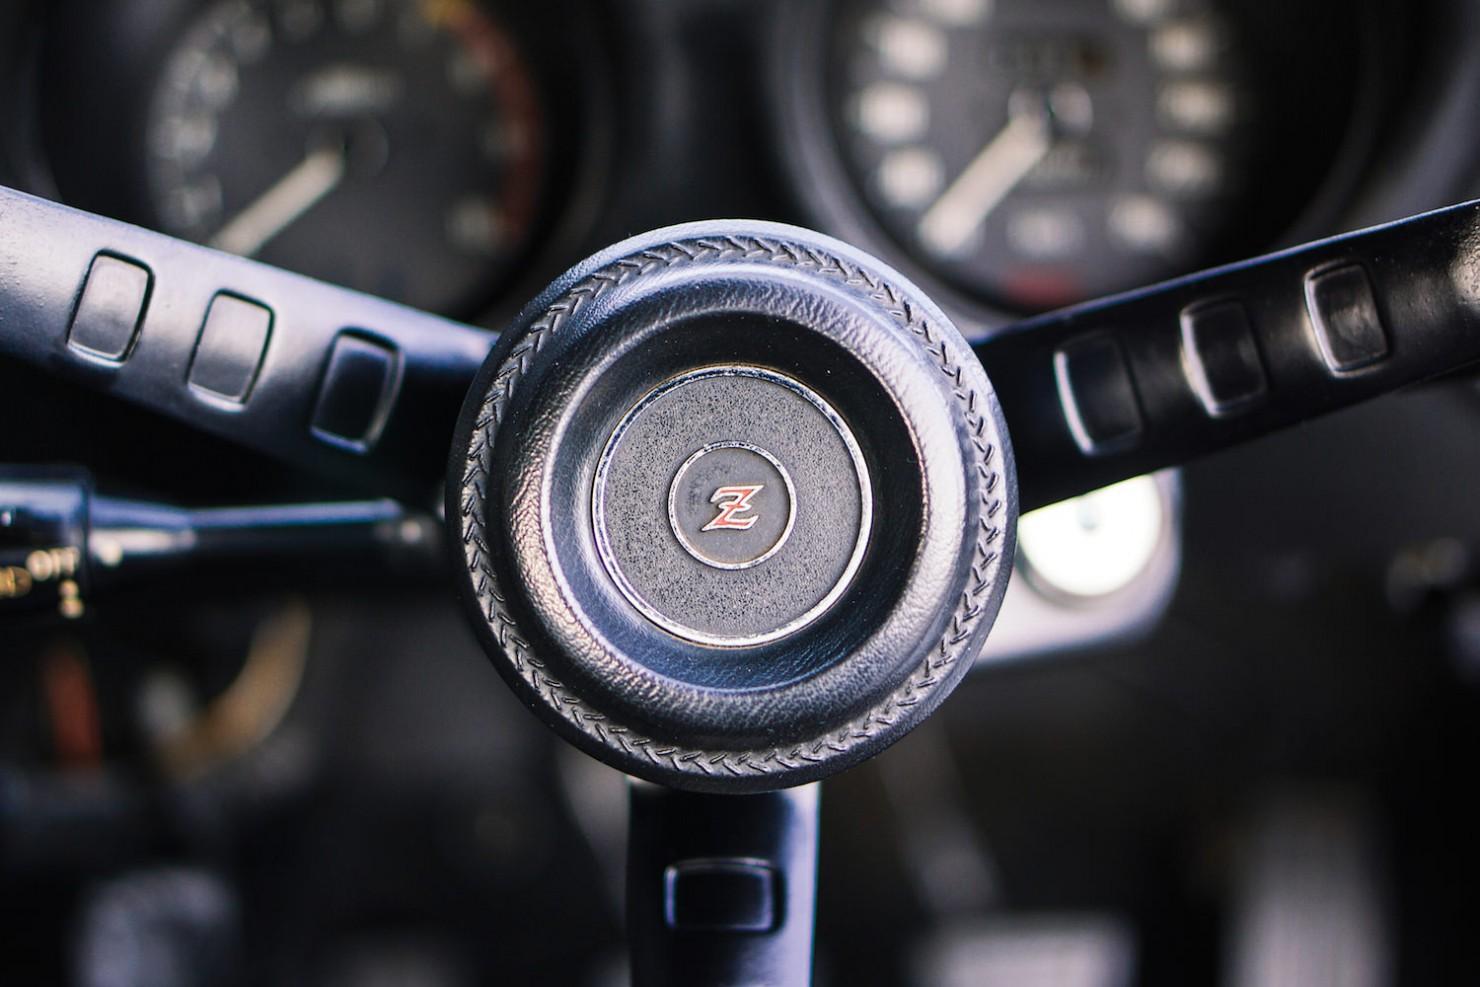 Nissan-Fairlady-Z-432-11